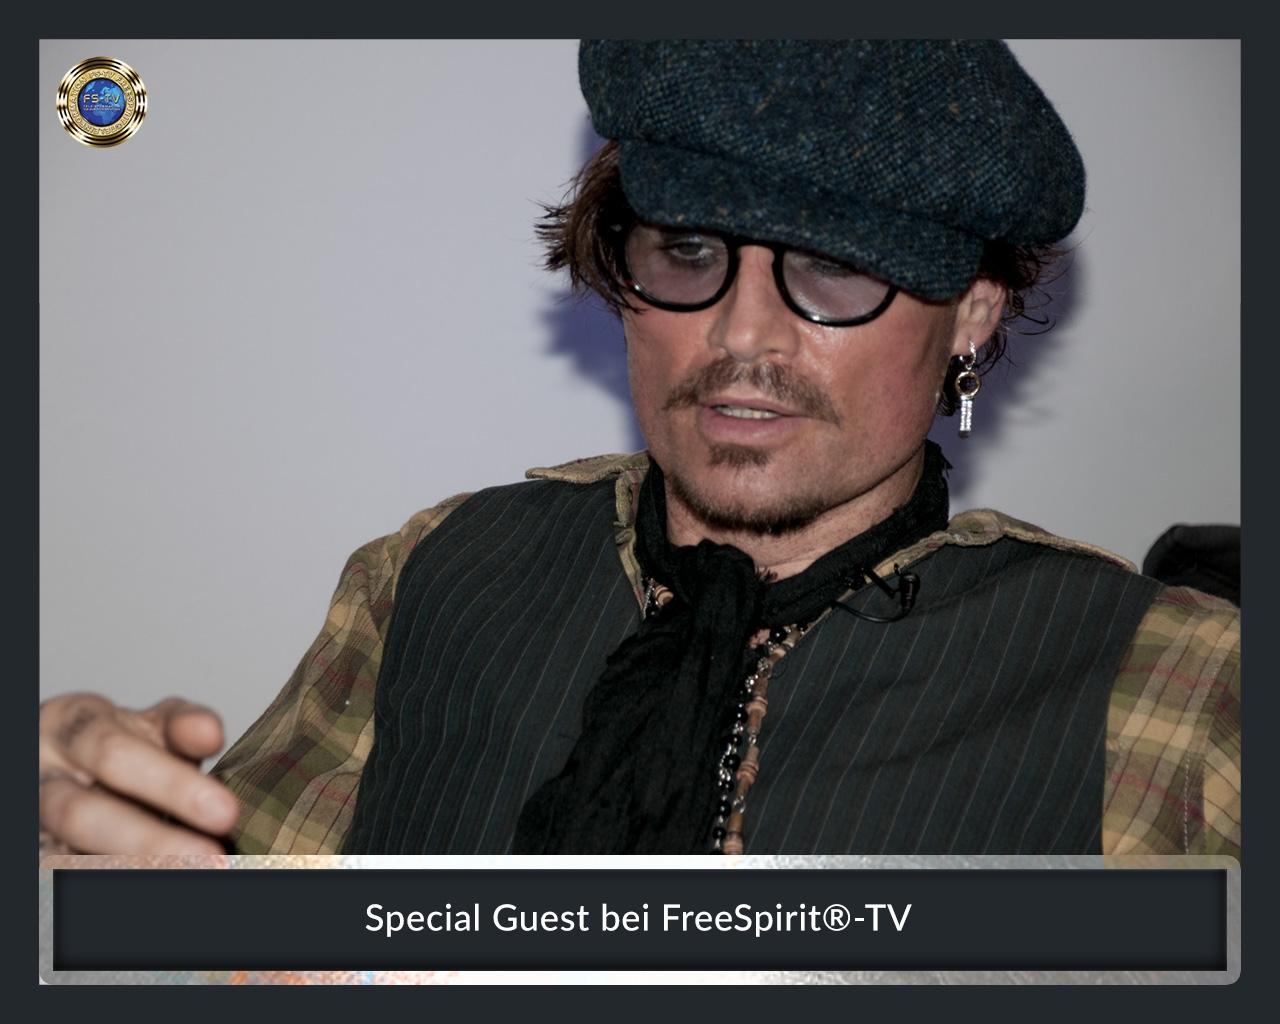 FS-TV-Bildergallerie-Special-Guest-5